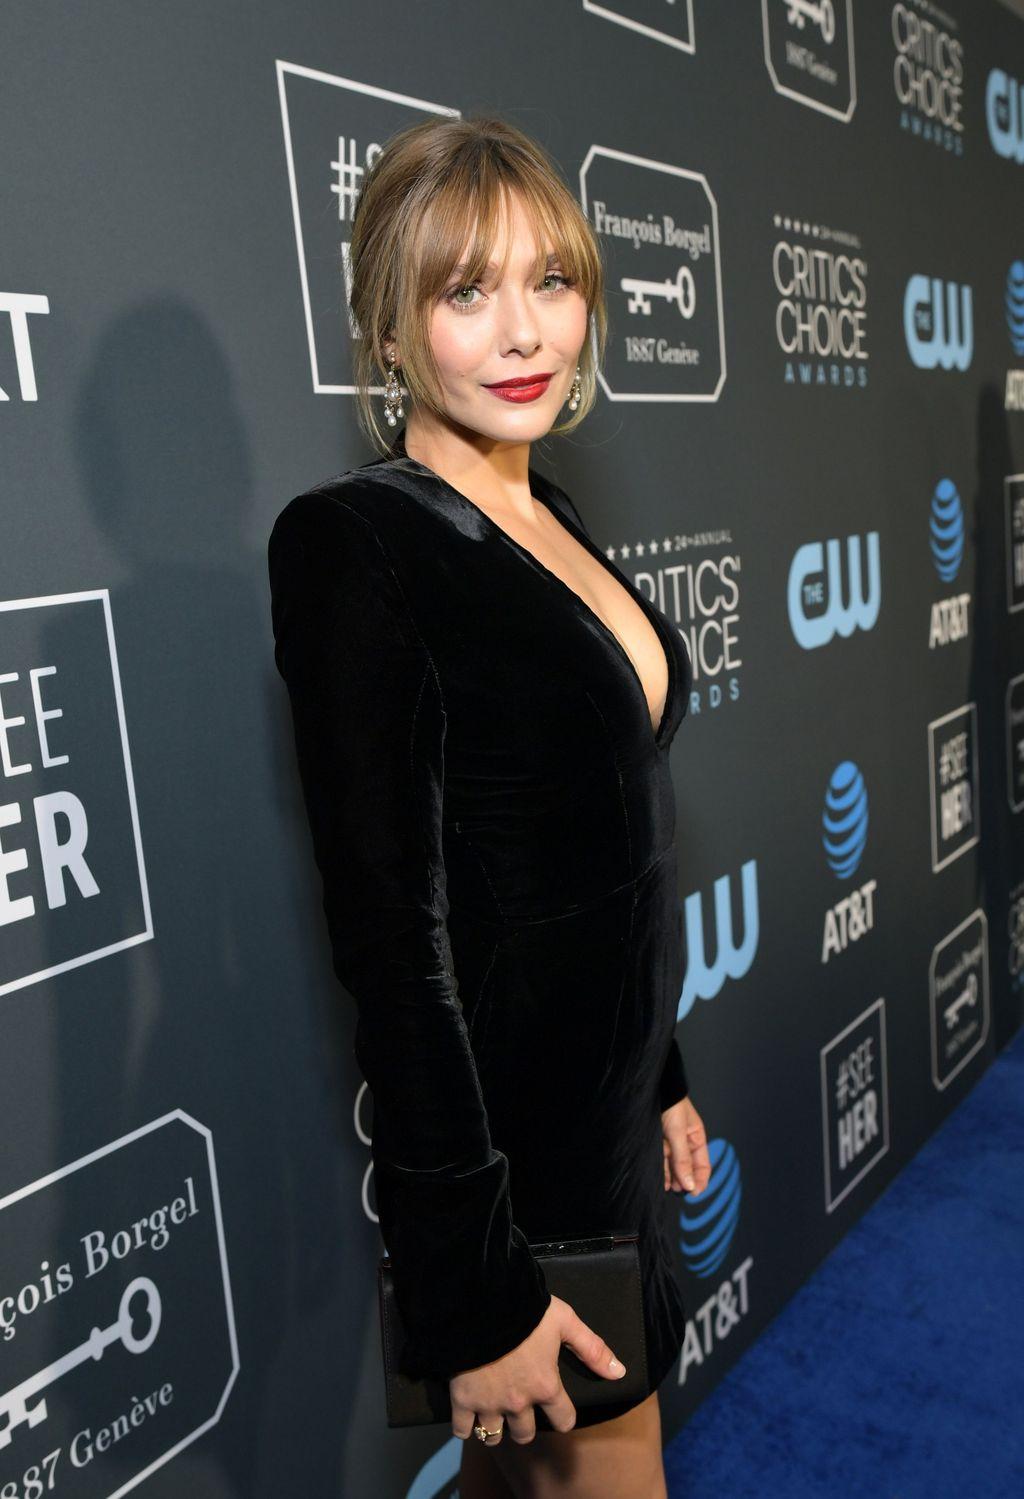 SANTA MONICA, CA - JANUARY 13:  Elizabeth Olsen attends the 24th annual Critics' Choice Awards at Barker Hangar on January 13, 2019 in Santa Monica, California.  (Photo by Jon Kopaloff/Getty Images)